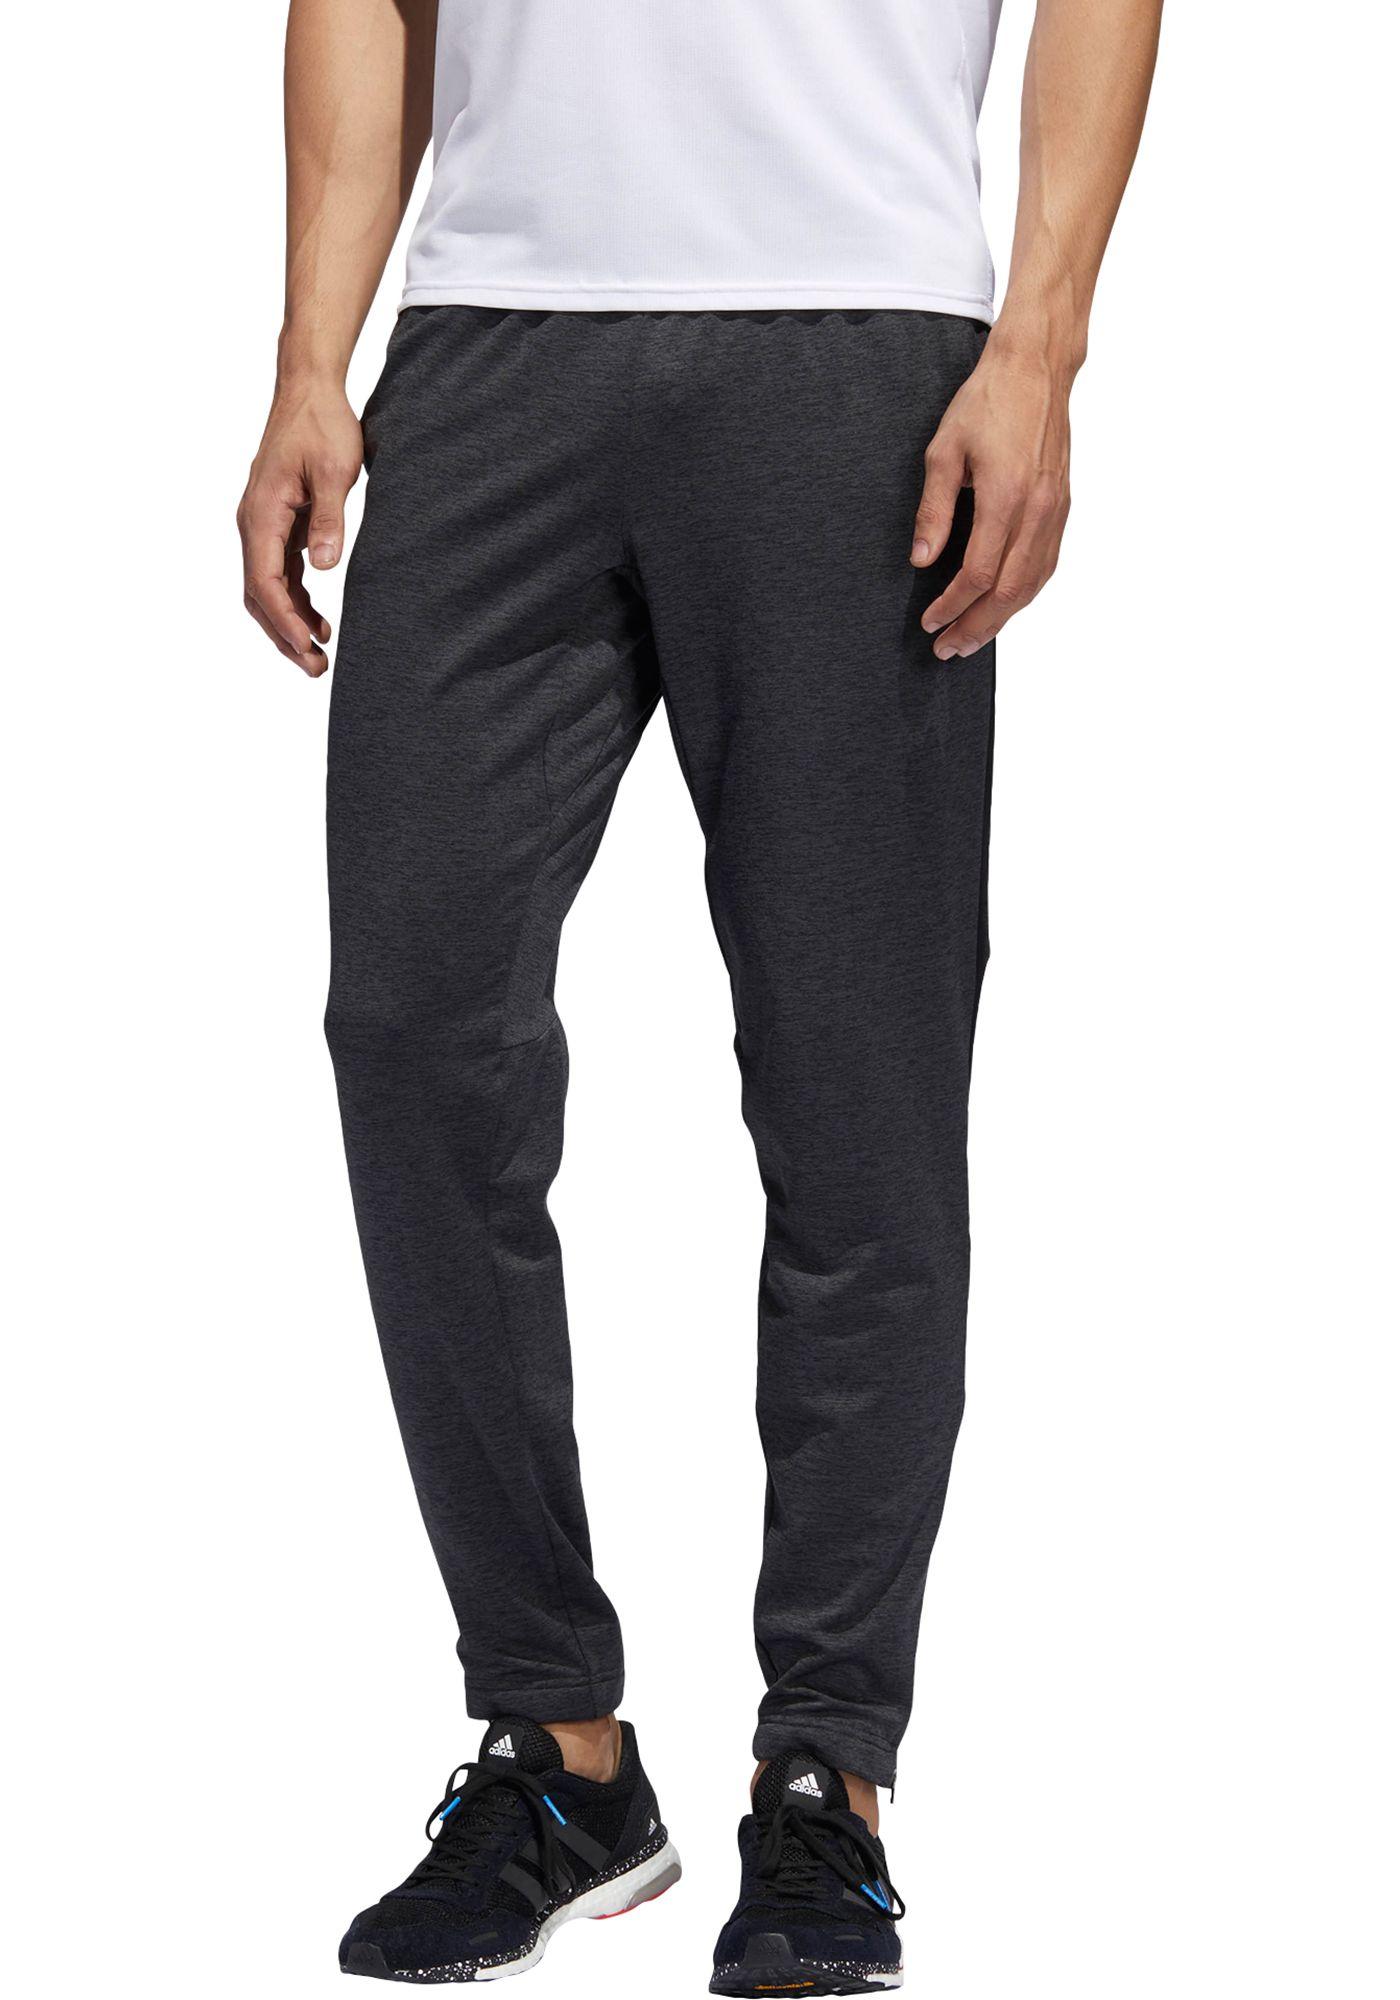 adidas Men's Response Astro Running Pants